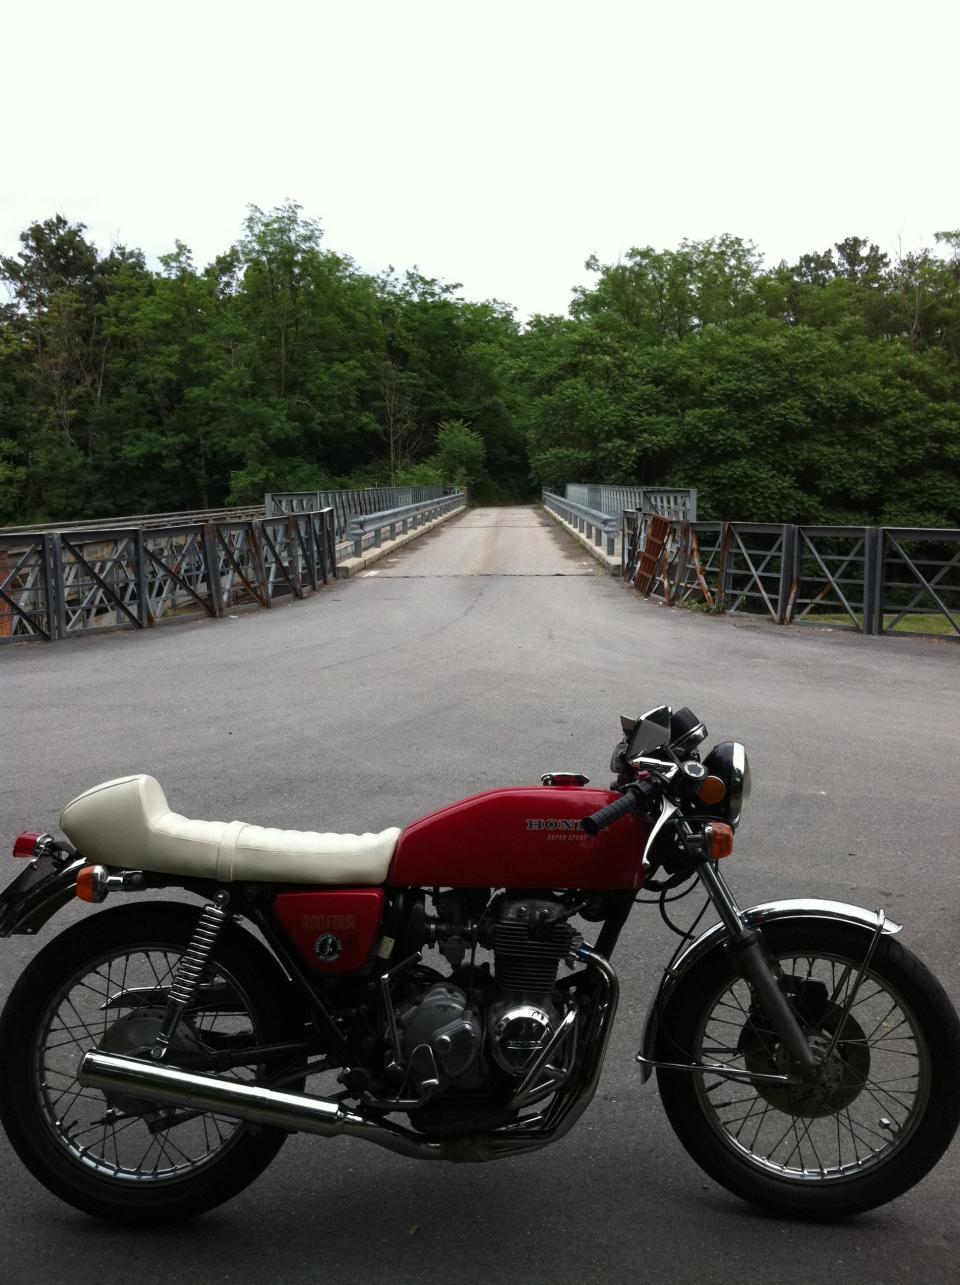 photos from skatofix | 4into1.com Vintage Honda Motorcycle ...